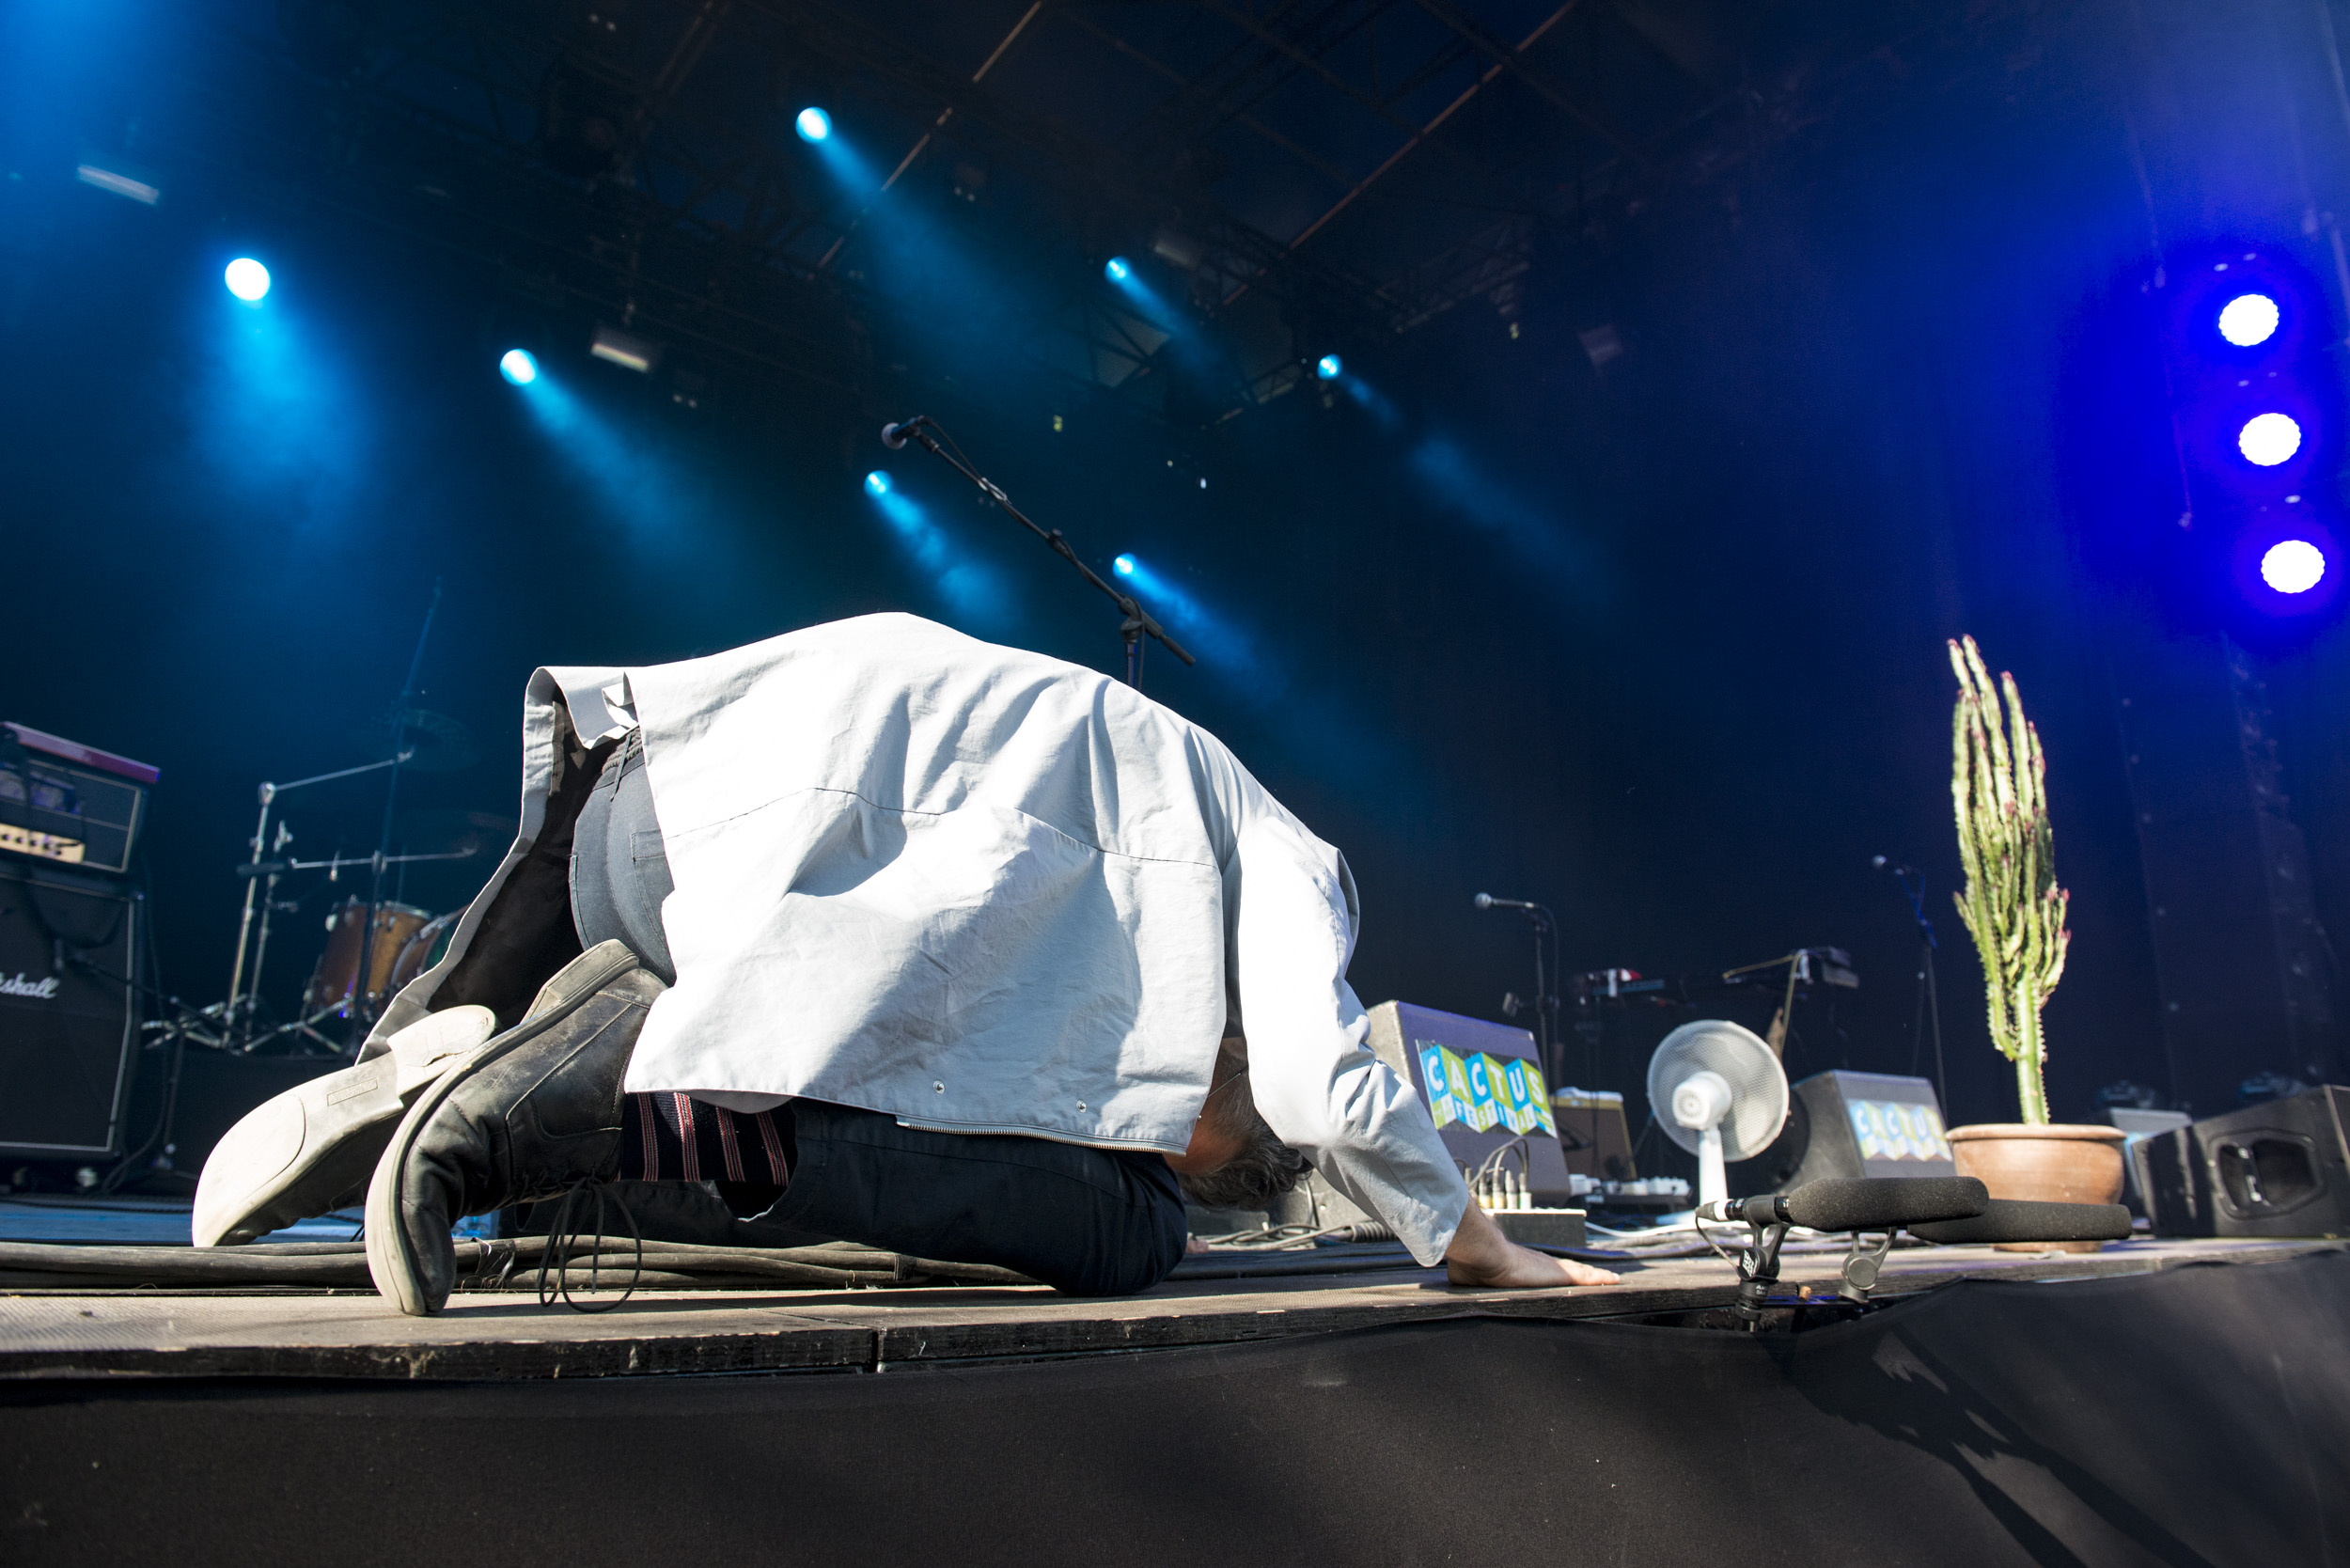 Millionaire @ Cactusfestival 2017, Dag 2 (Nick De Baerdemaeker)